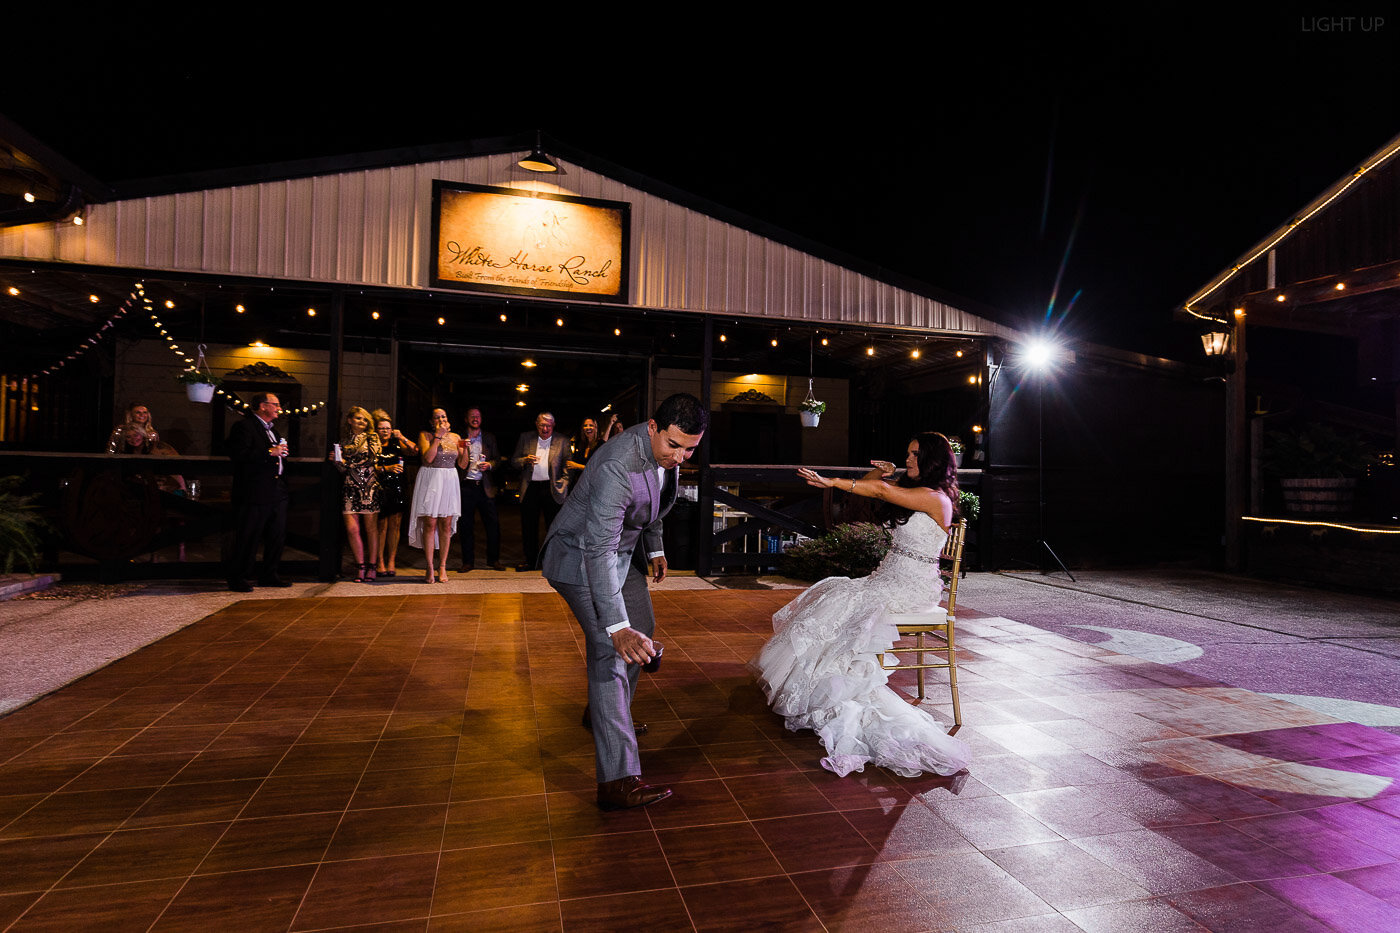 Lakeland-barn-wedding-at-white-horse-ranch-109.jpg